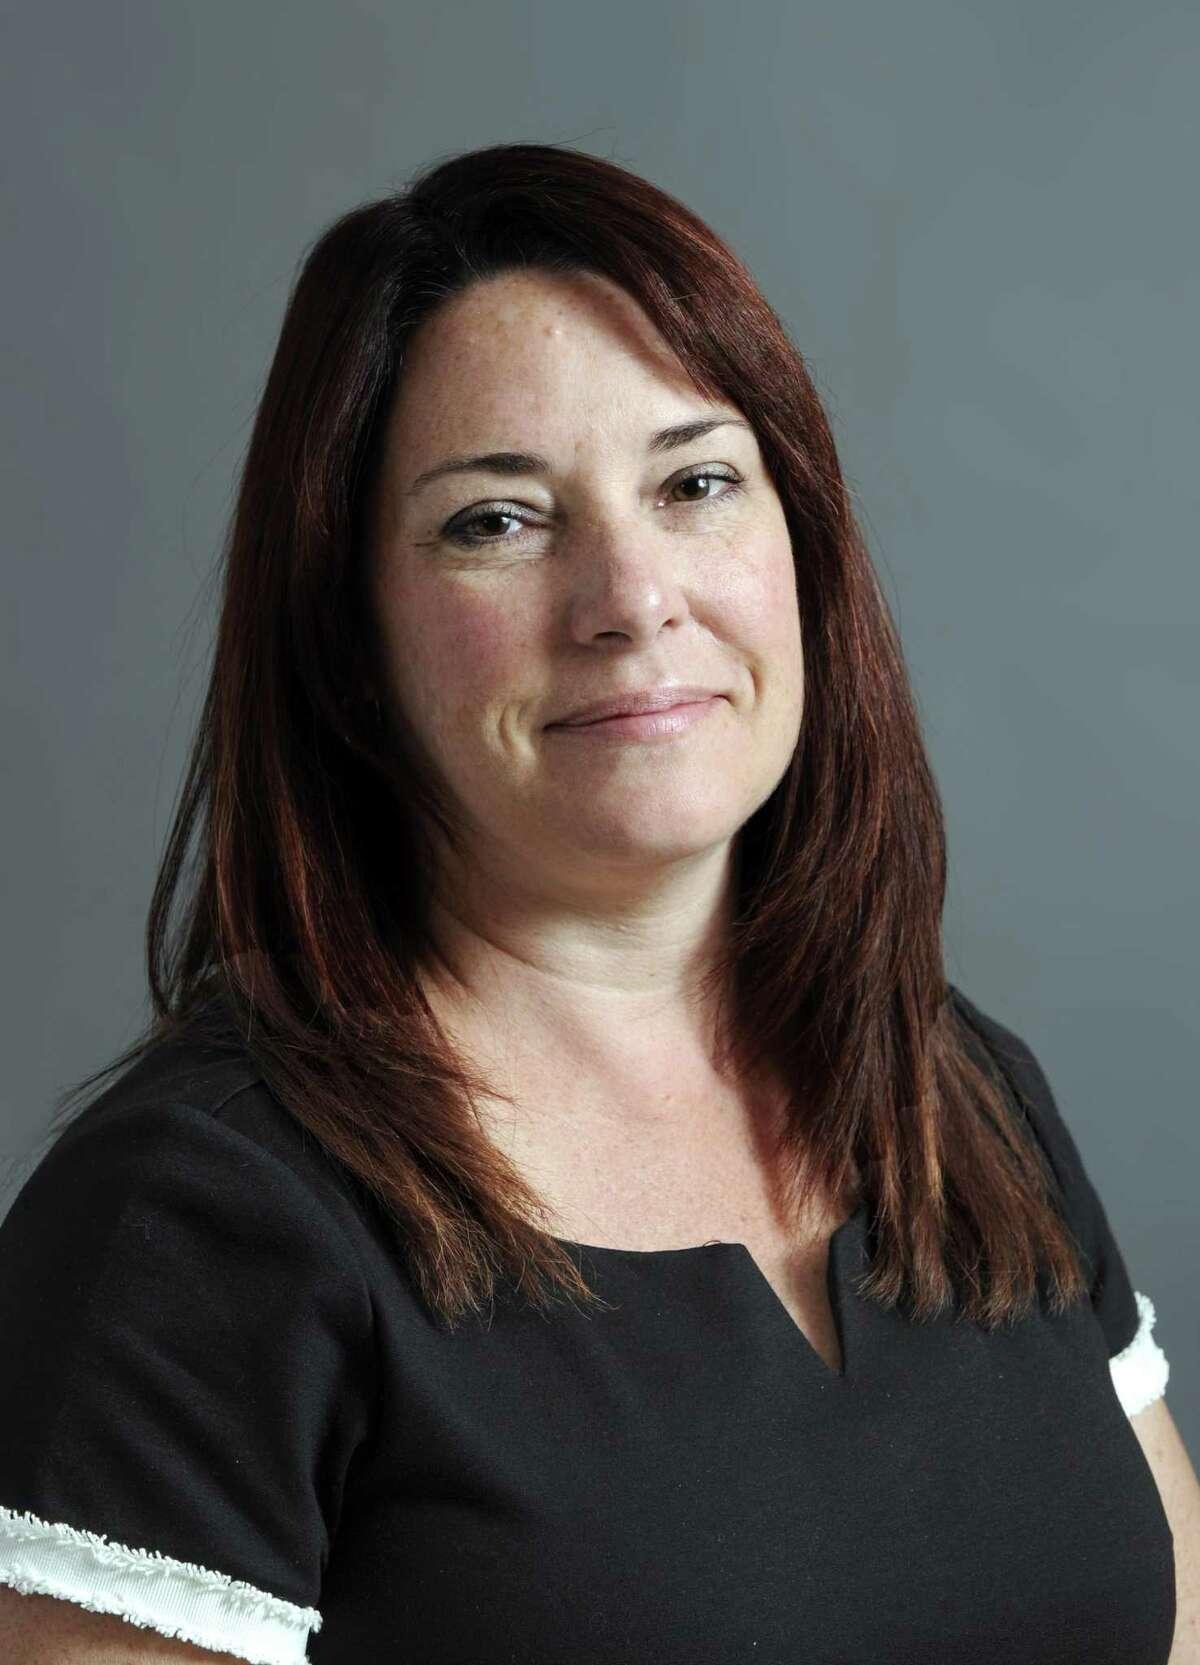 Susan Chapman, First Selectman of New Fairfield. Photo Tuesday, Oct. 31, 2017.